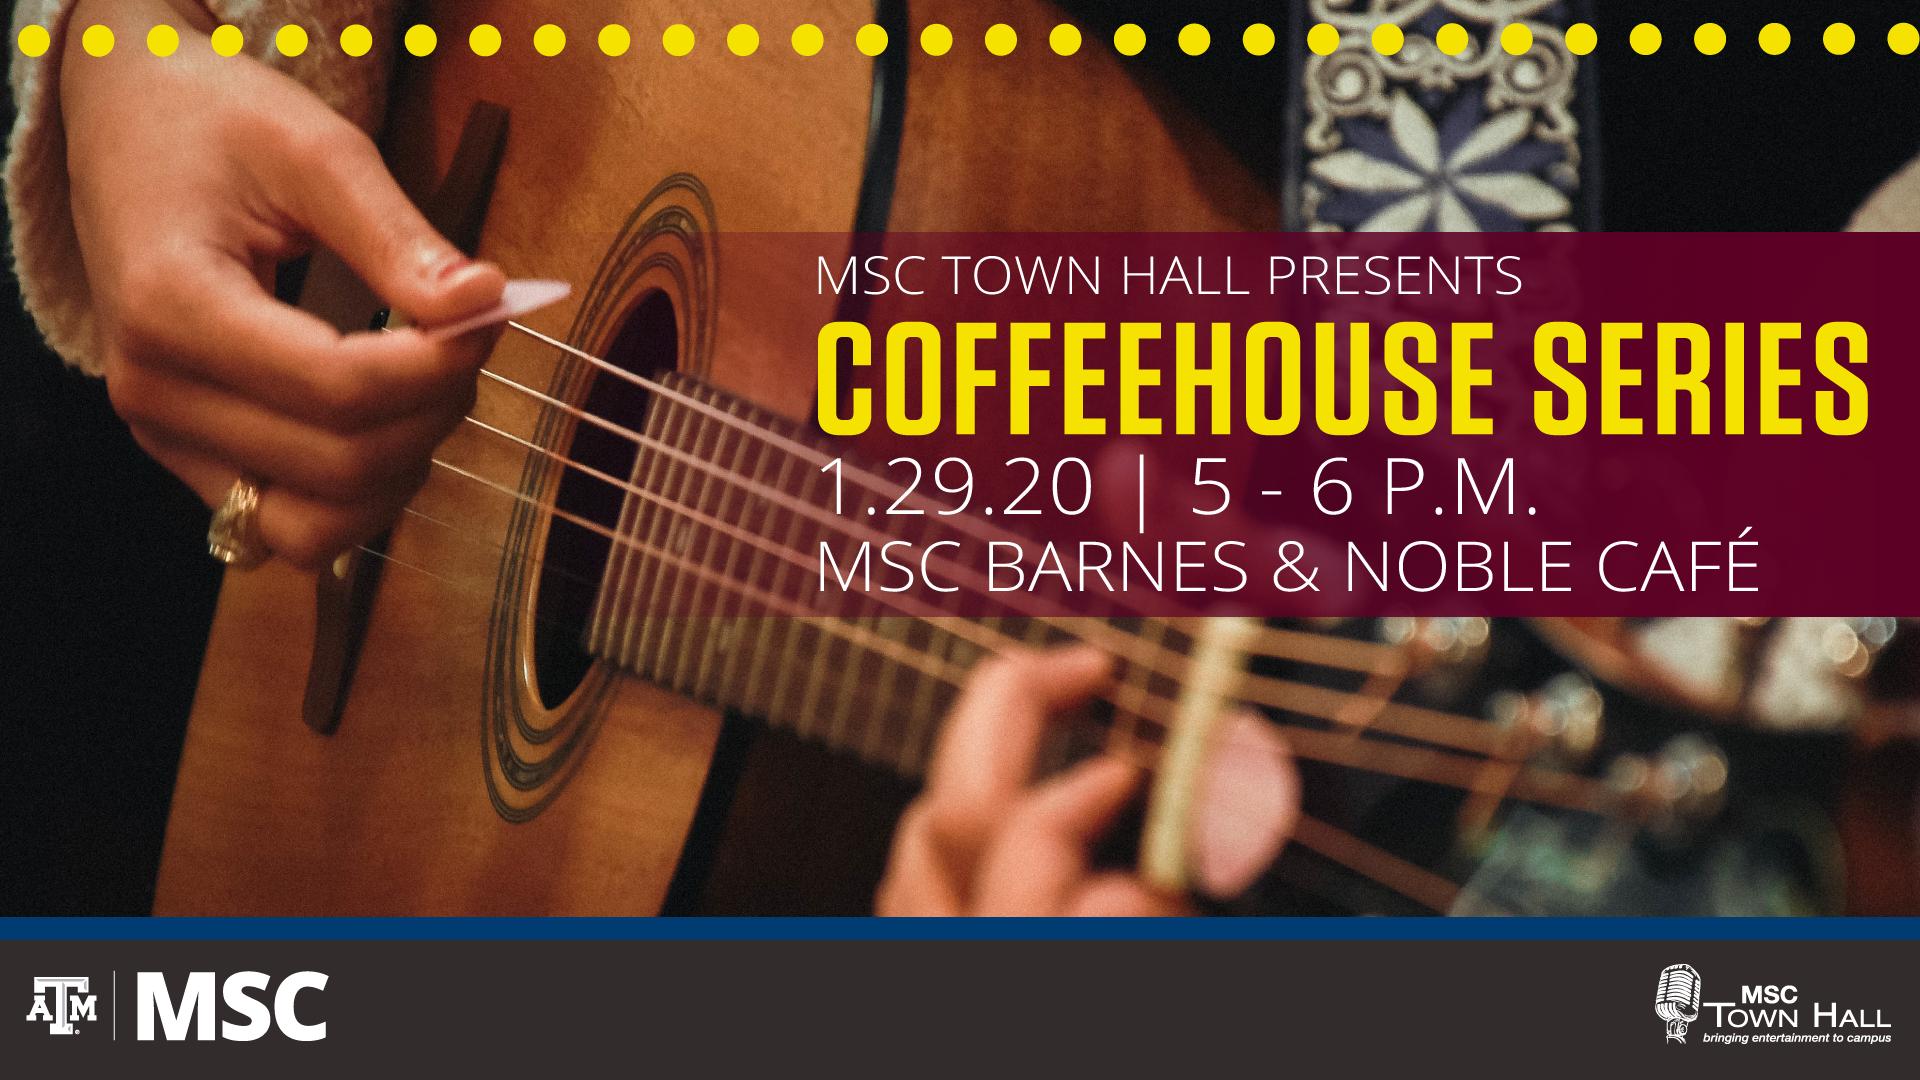 Coffeehouse Series, 5-7 p.m., Barnes and Noble Café